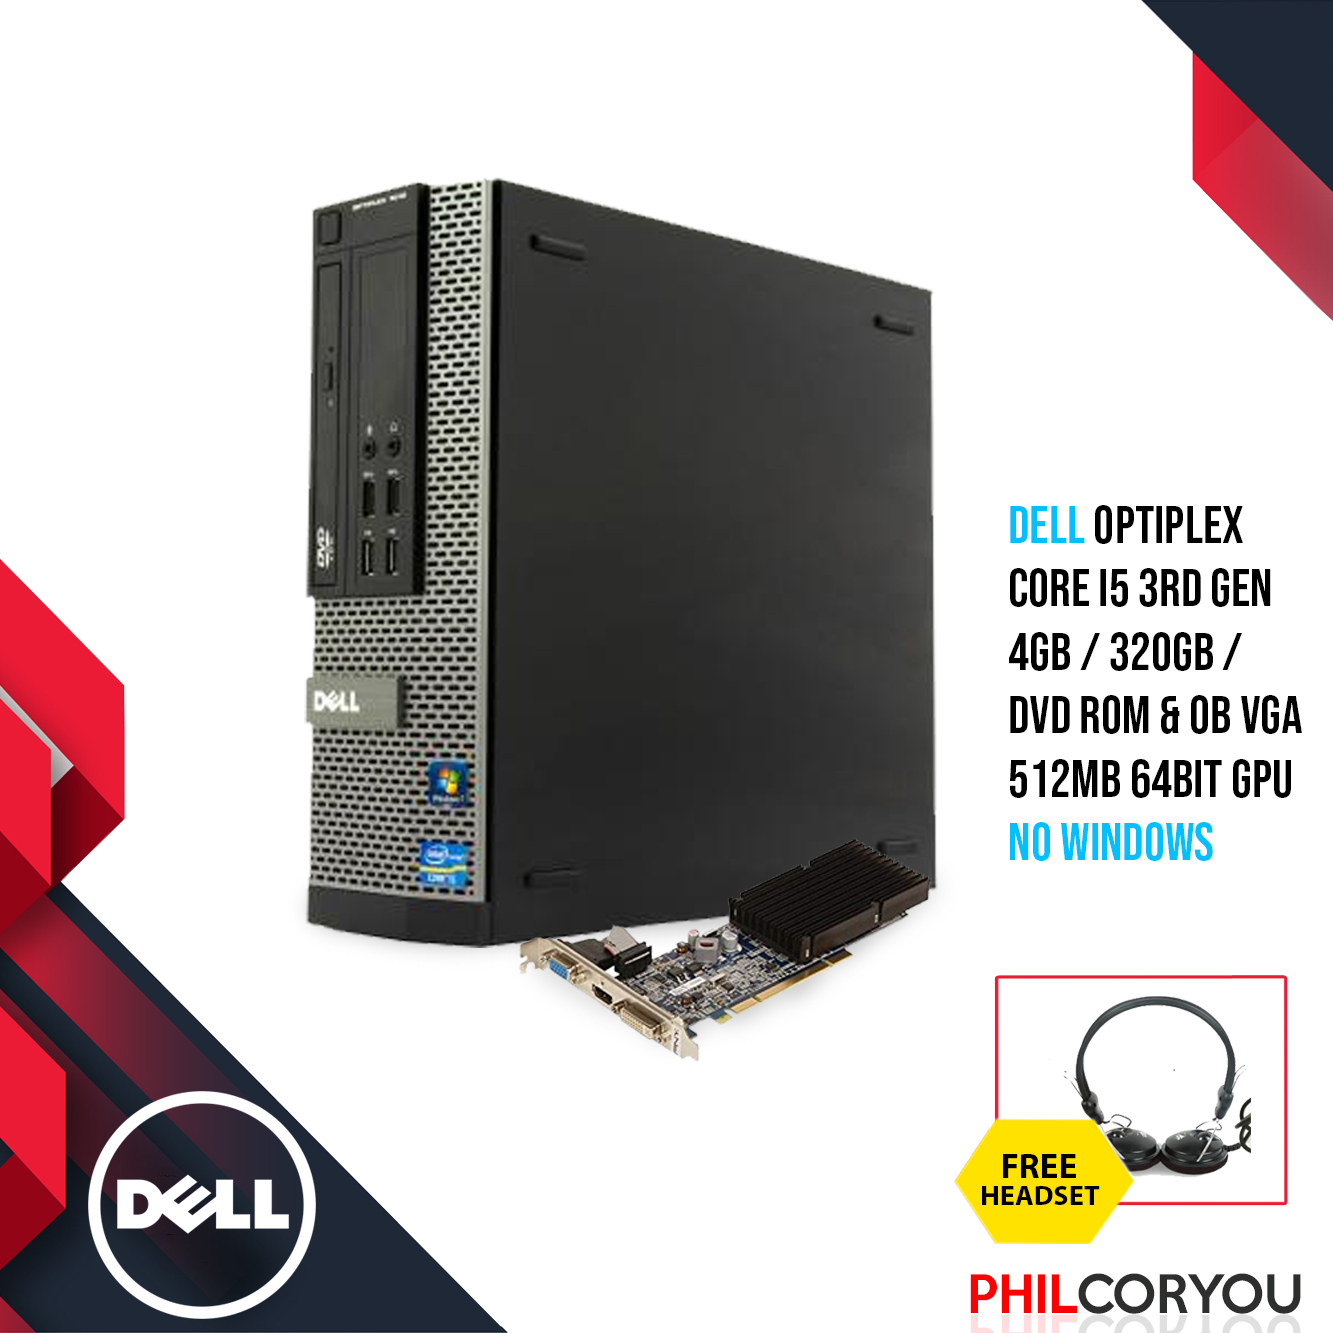 [Desktop] Dell Optiplex 7010 i5-3470 3 1Ghz(3rd Gen) 4GB 320GB with Vcard  512mb 64bit & free Multimedia Headset with mic